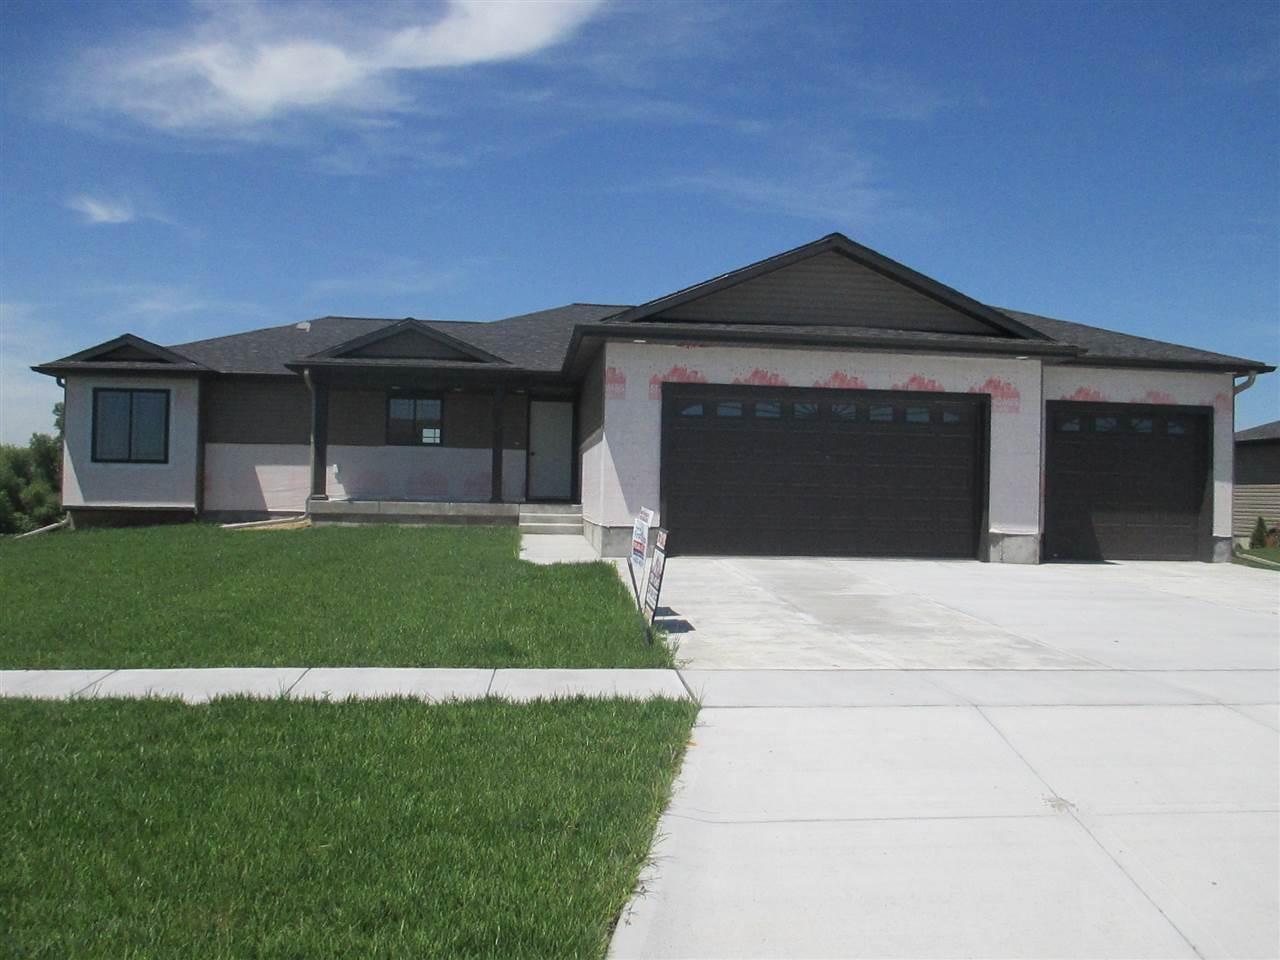 Real Estate for Sale, ListingId: 34345289, Hastings,NE68901